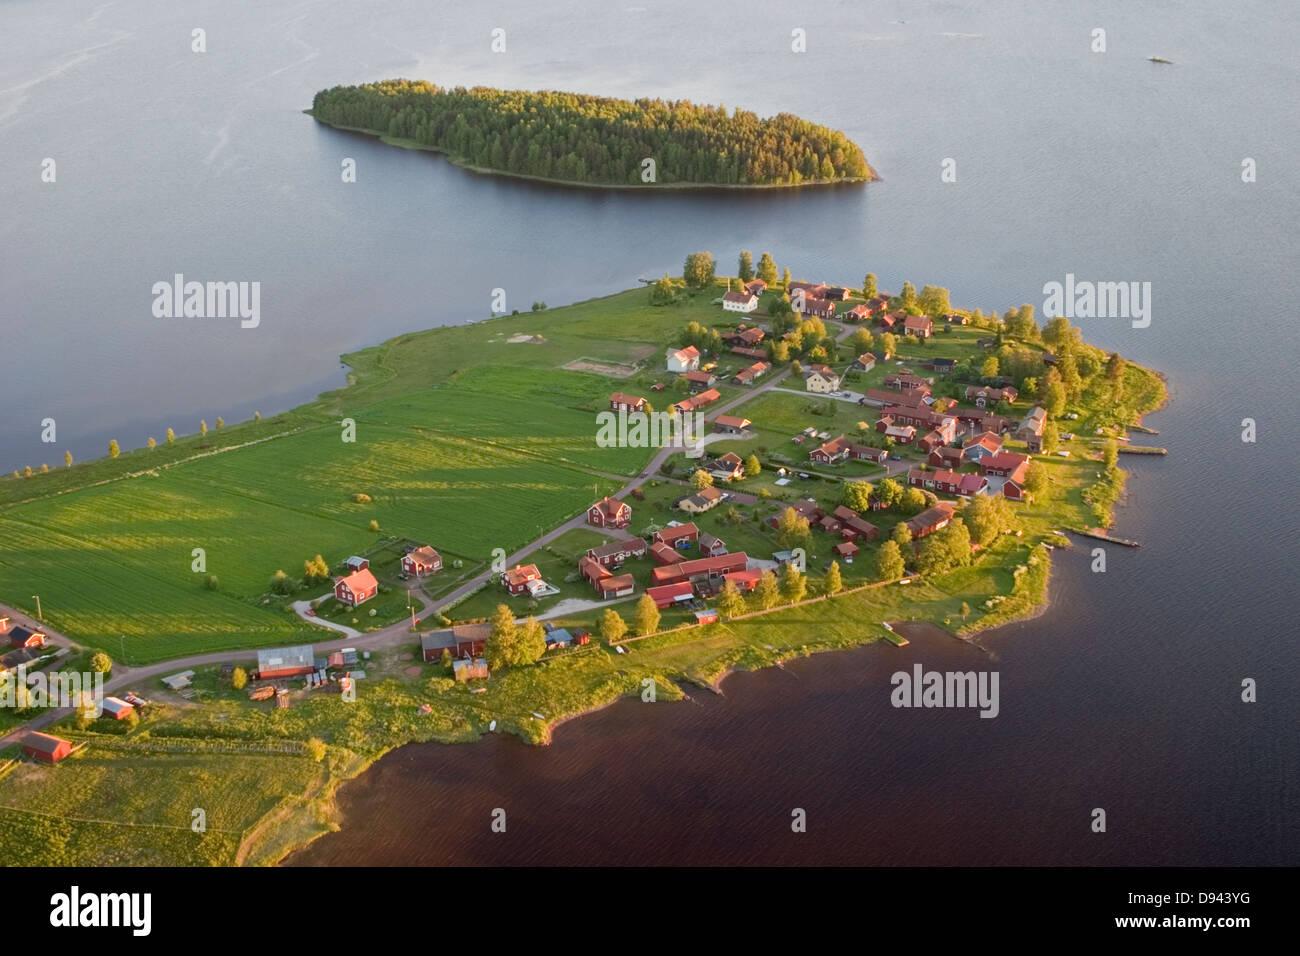 Islands in a lake, aerial view, Dalarna, Sweden. - Stock Image